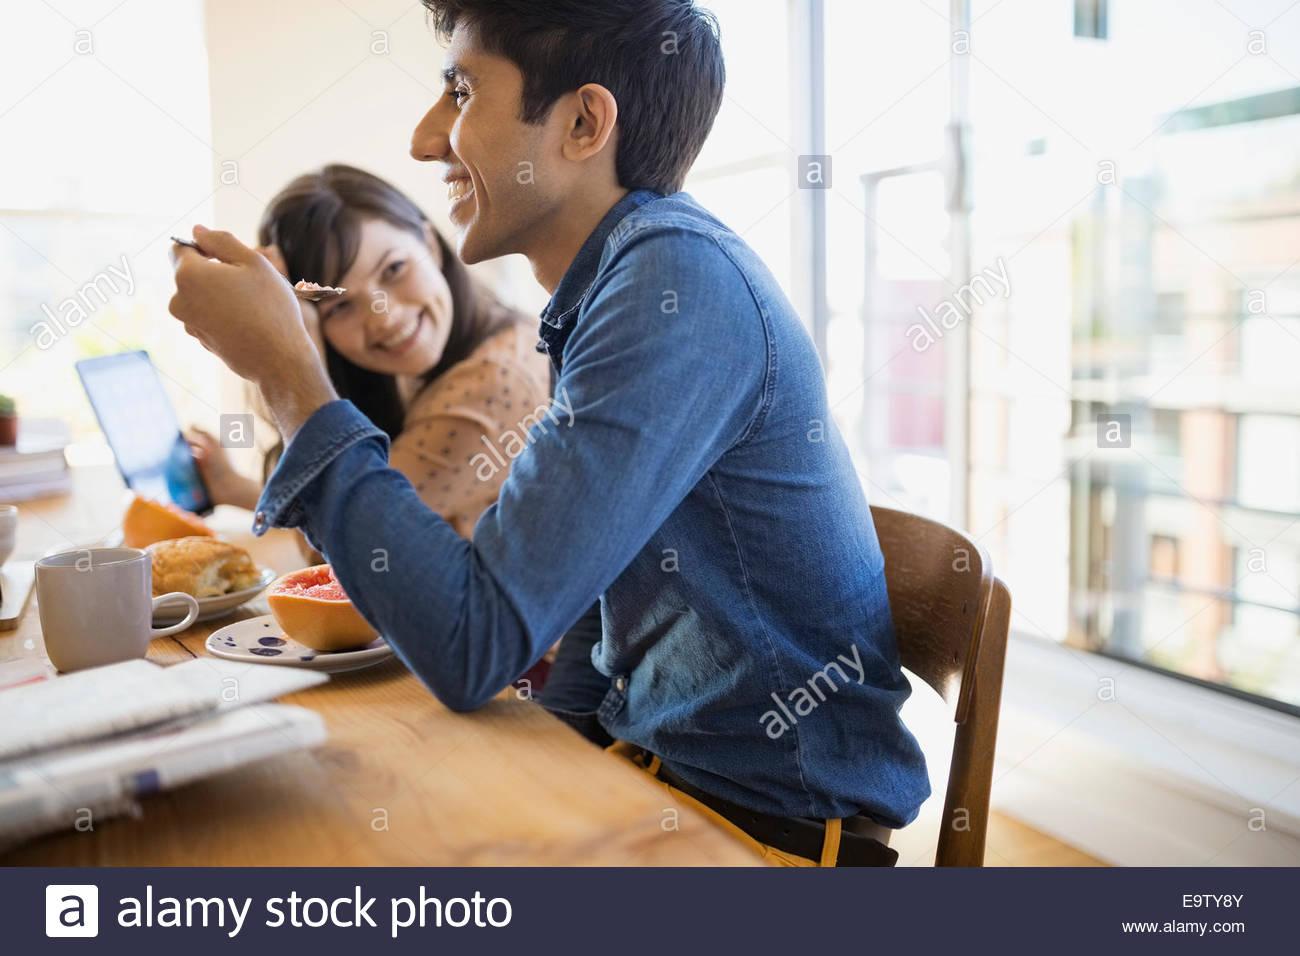 Couple enjoying breakfast at table - Stock Image